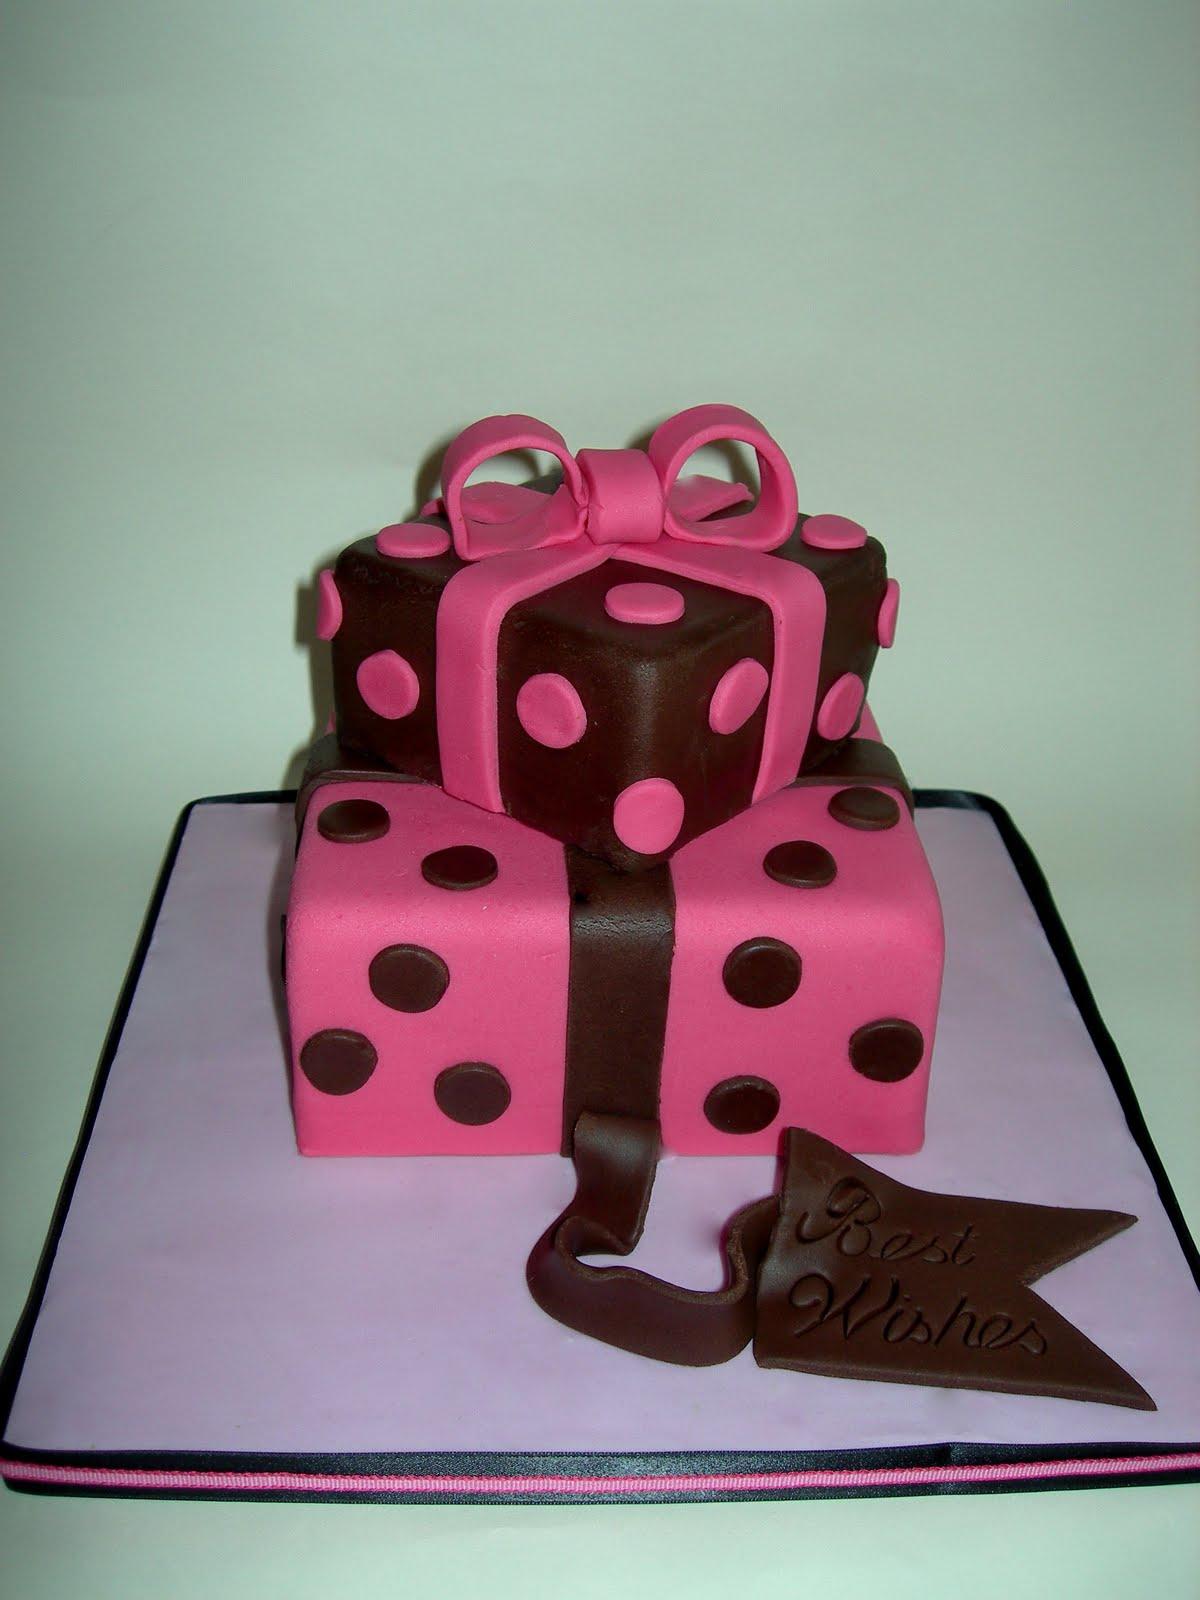 Custom Cake Designs Uk : Custom Cake Design: Present cake